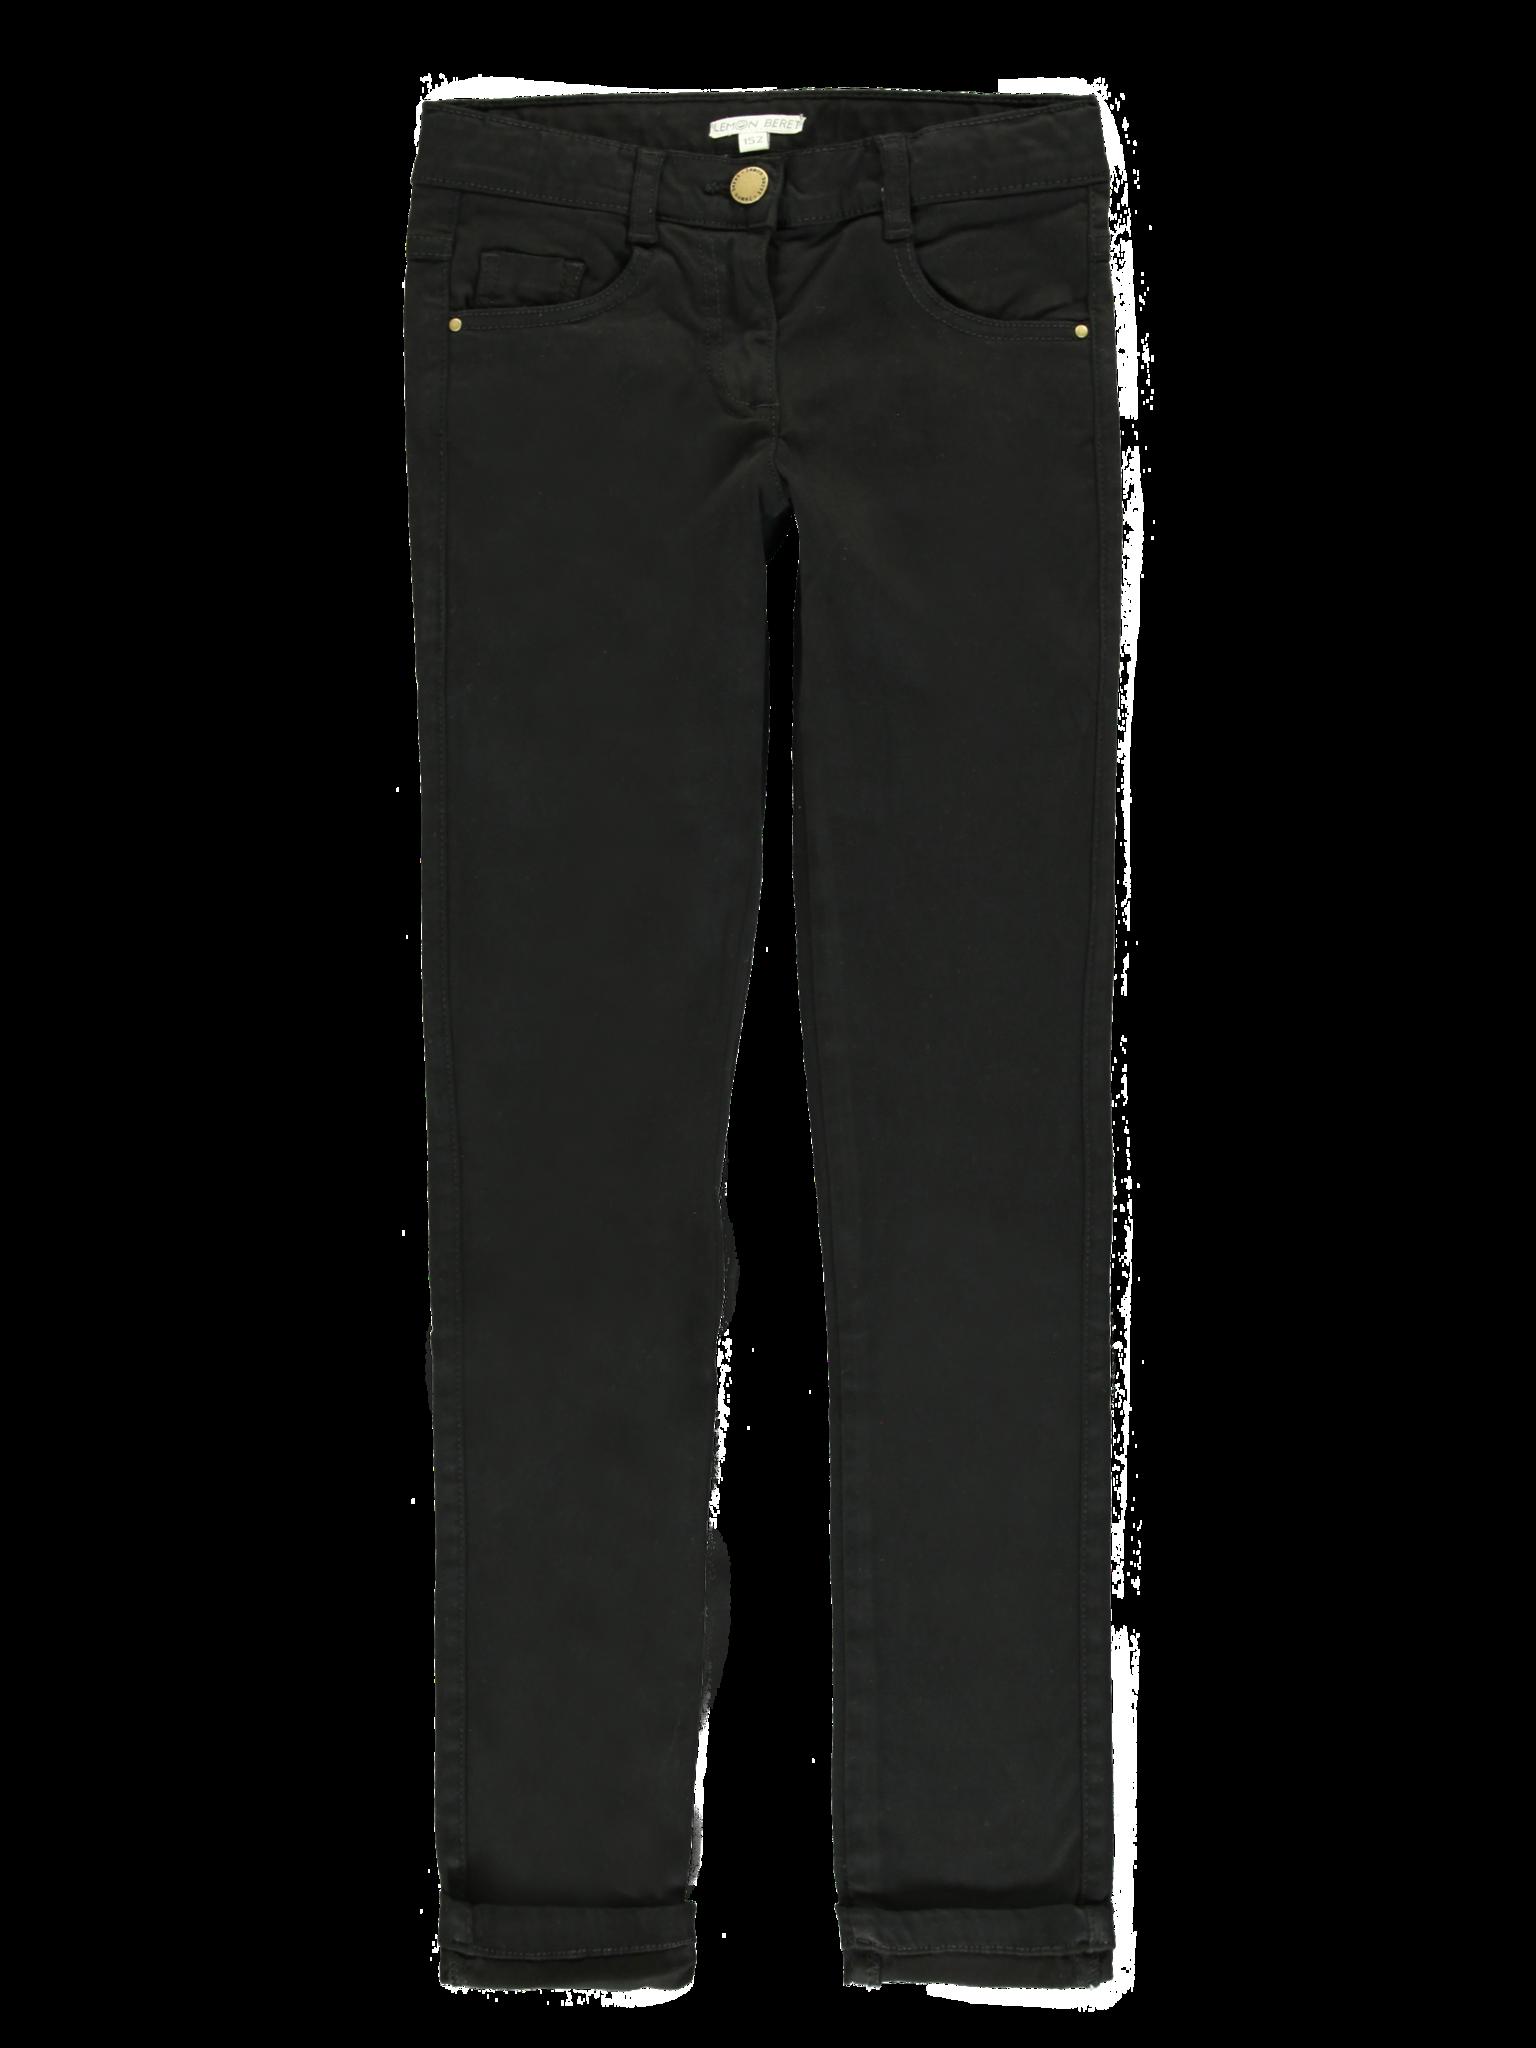 All Brands | Winterproducts Teen Girls | Pants | 10 pcs/box